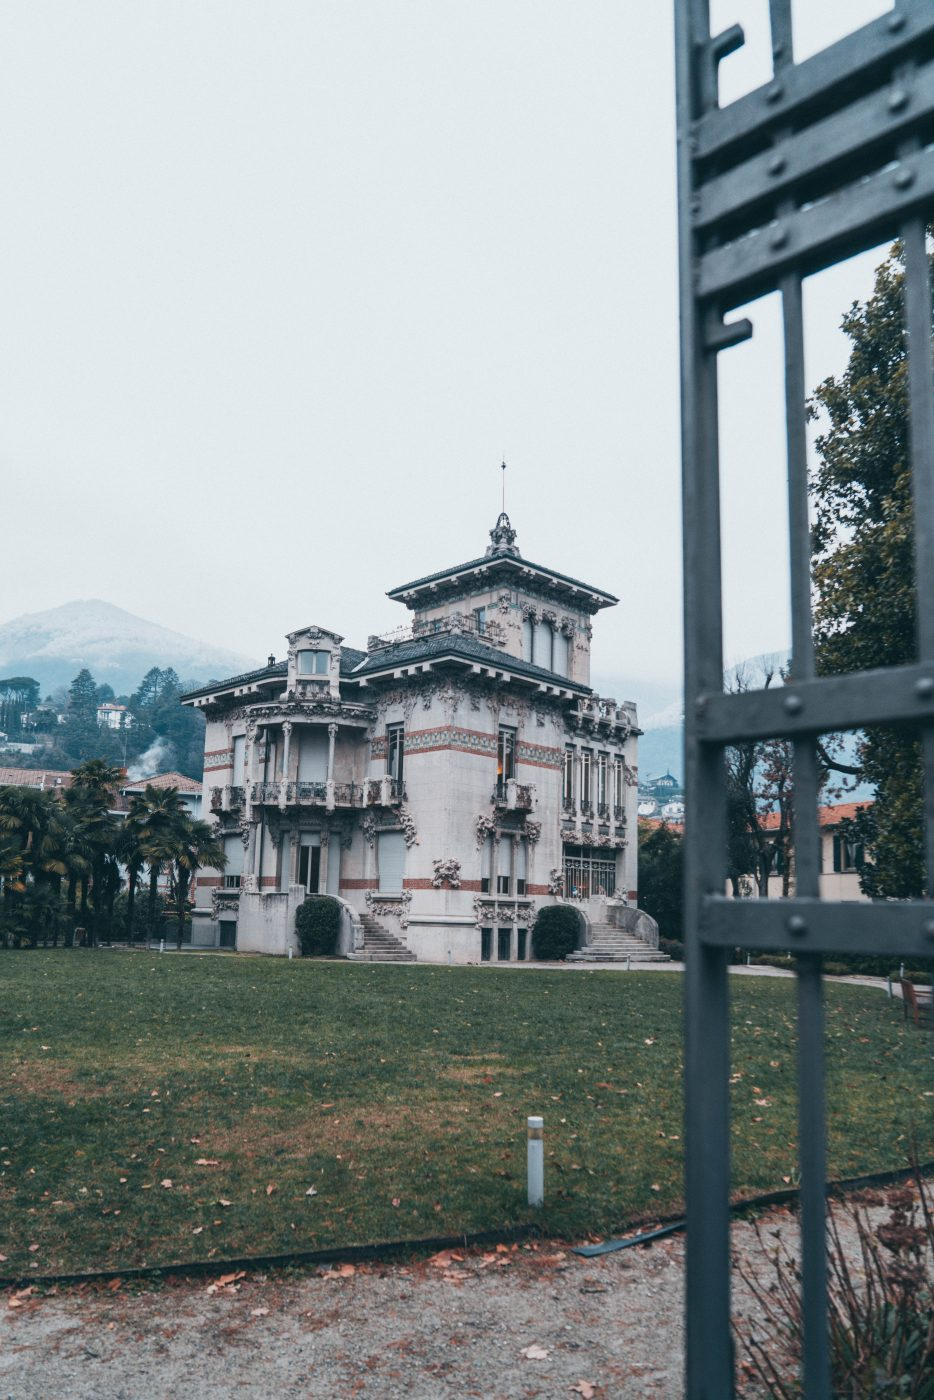 Villa Bernasconi, Cernobbio, Lombardy, Lombardia, Lake Como